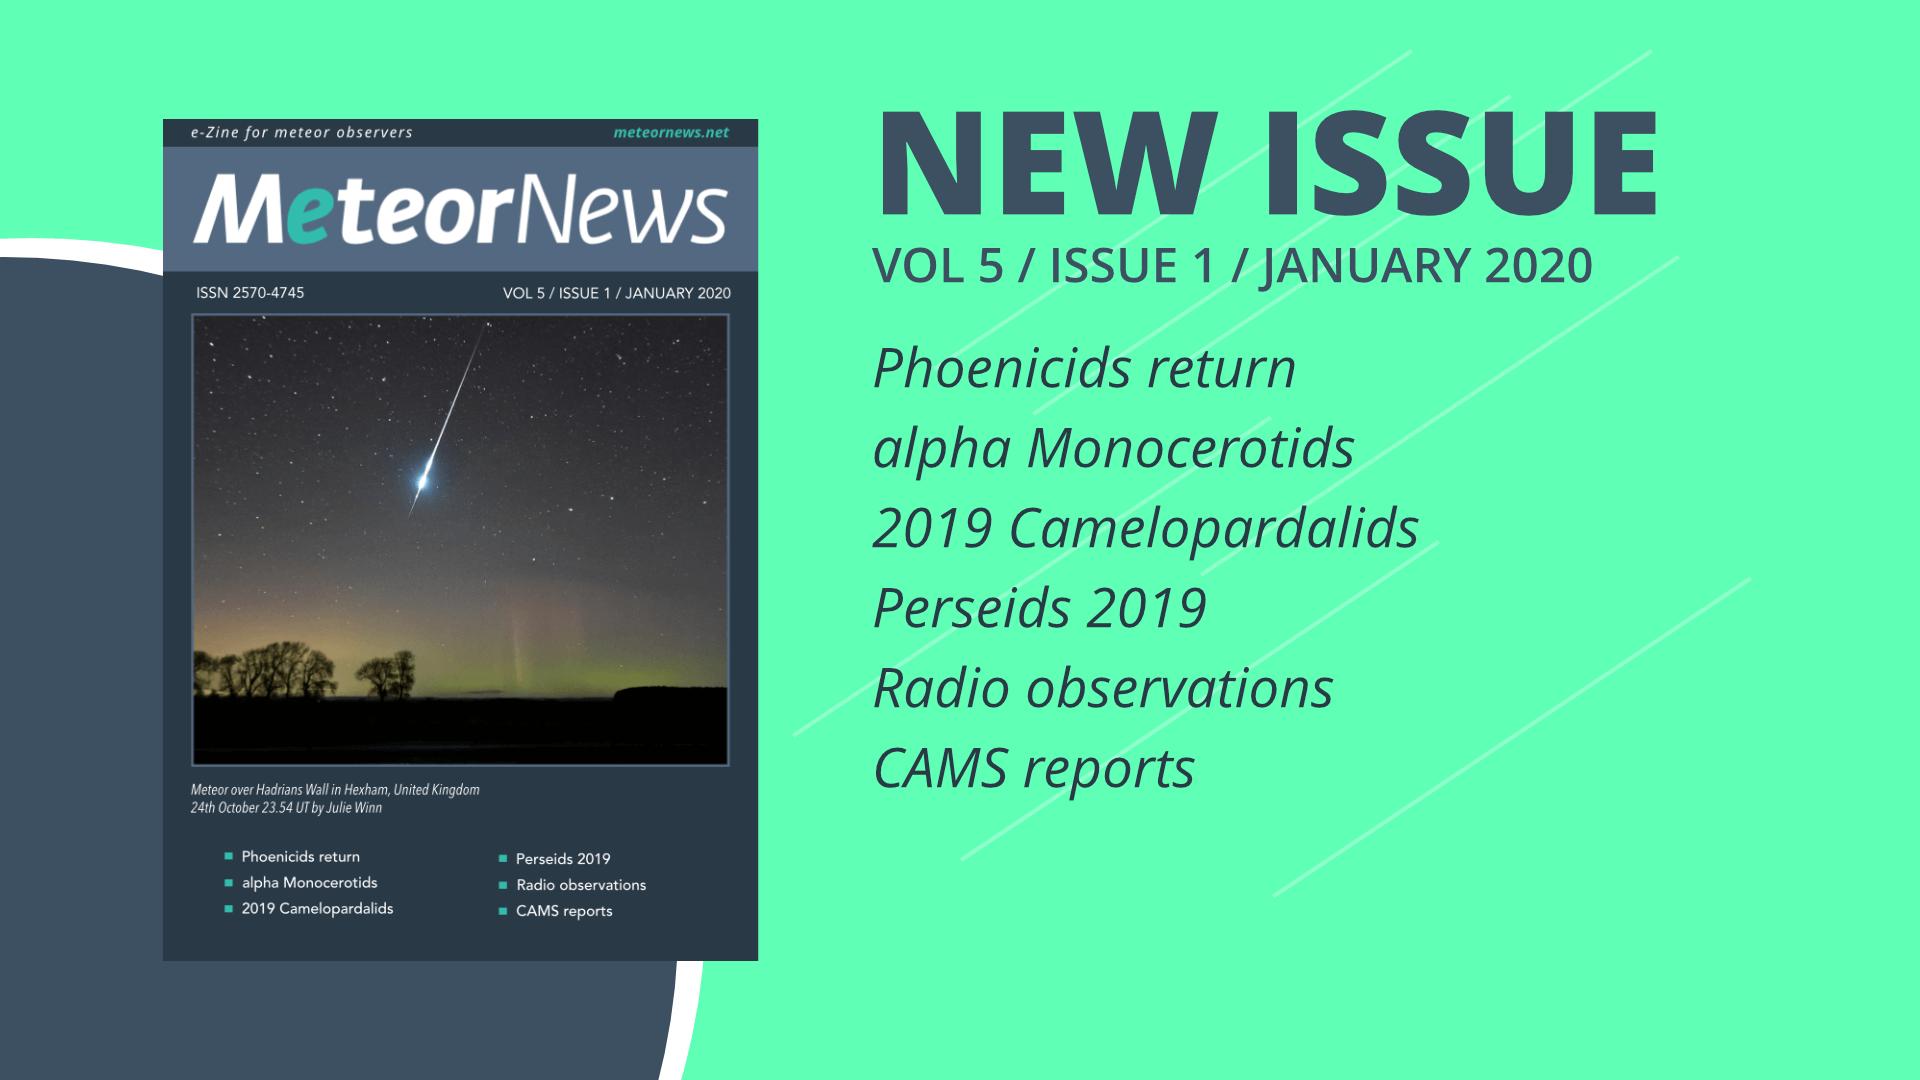 January 2020 issue of eMeteorNews online!